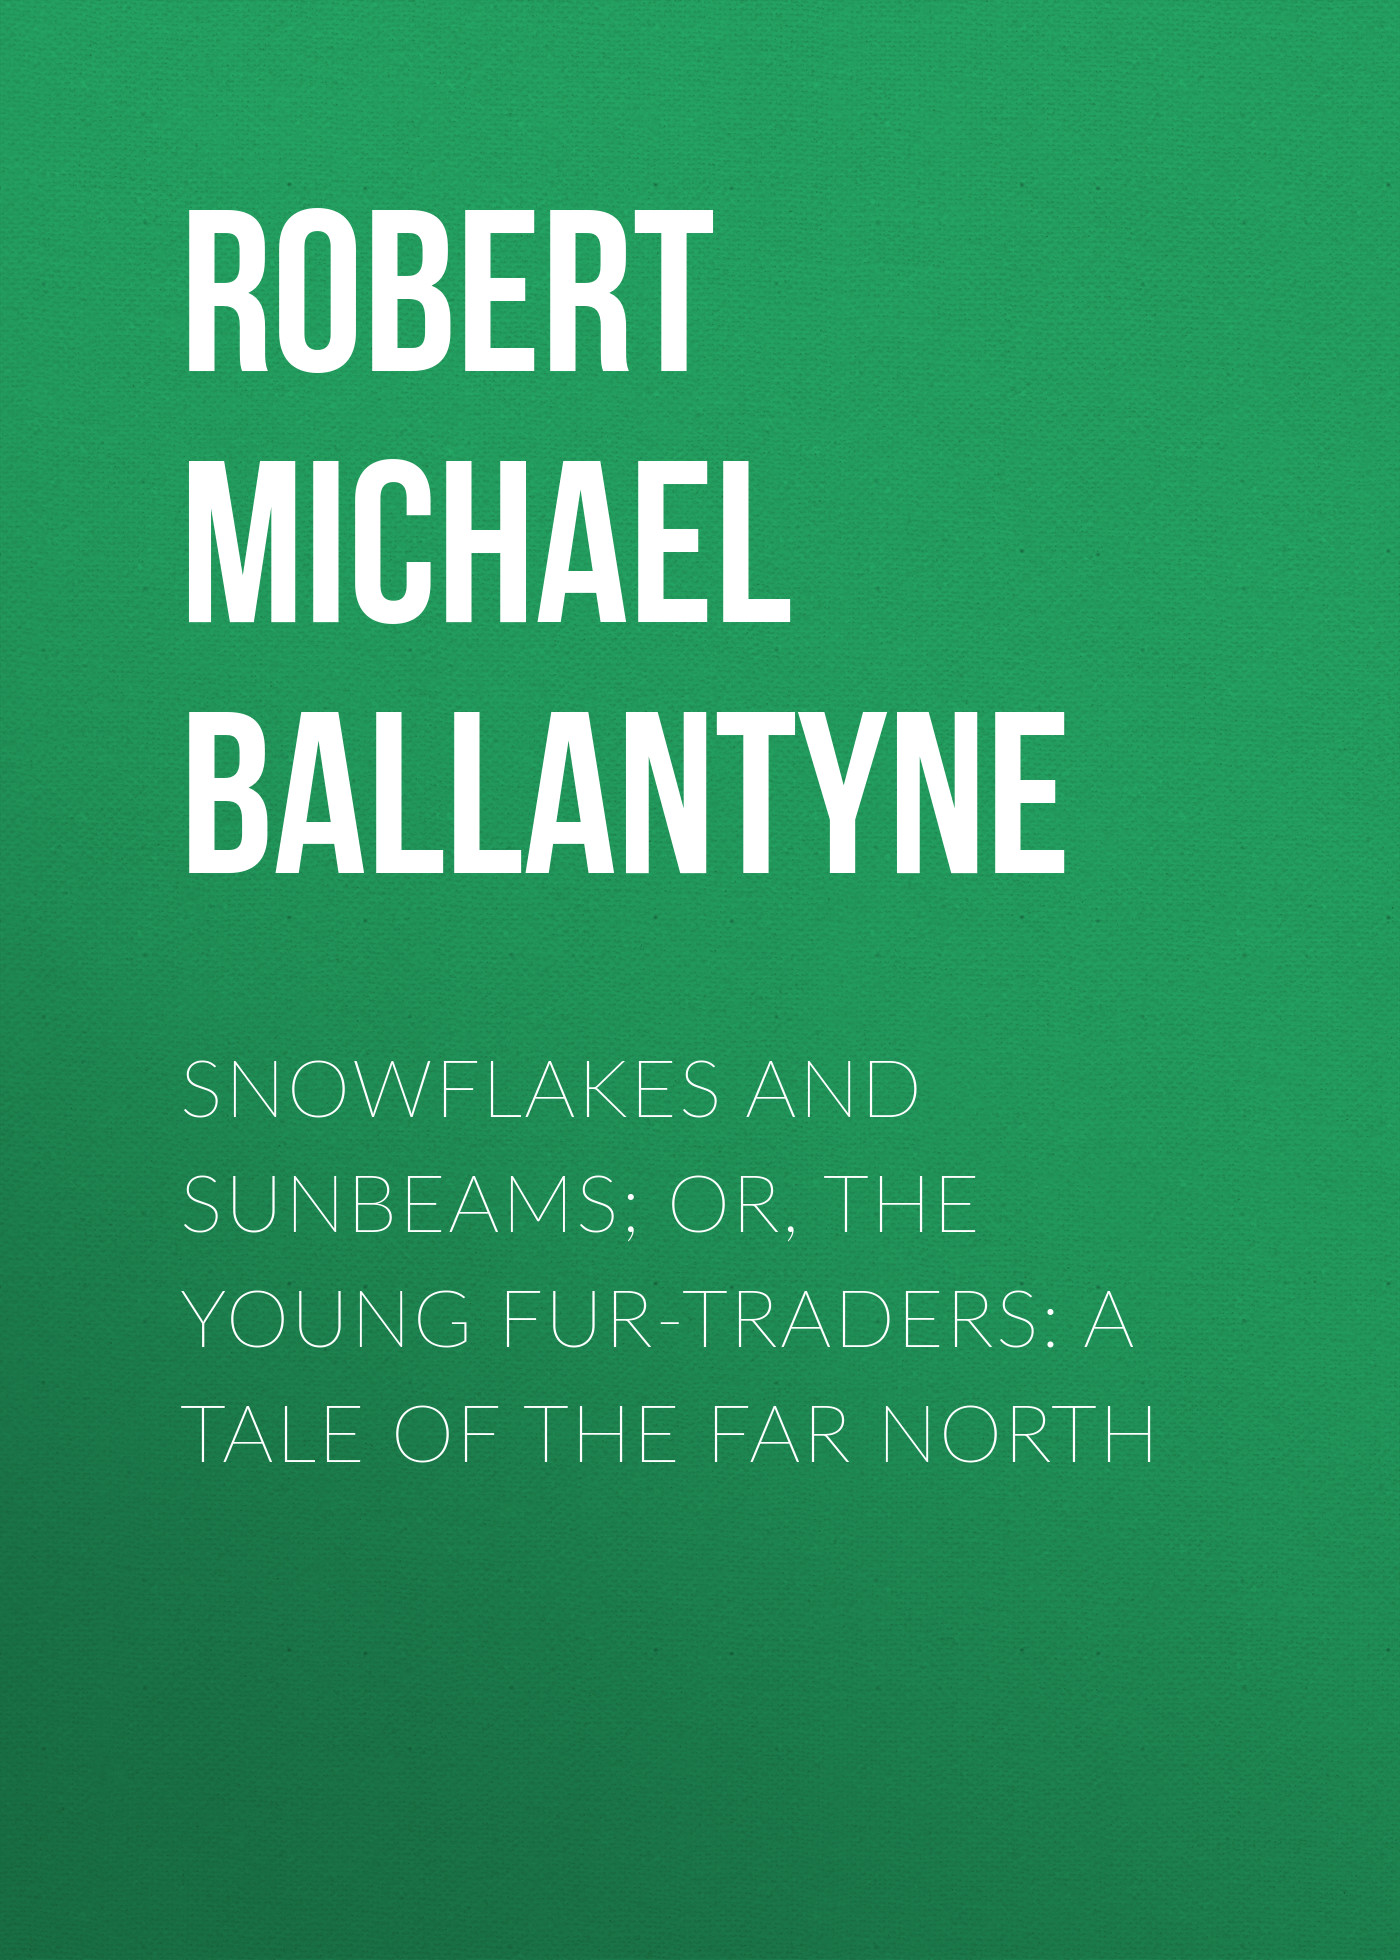 цены на Robert Michael Ballantyne Snowflakes and Sunbeams; Or, The Young Fur-traders: A Tale of the Far North в интернет-магазинах